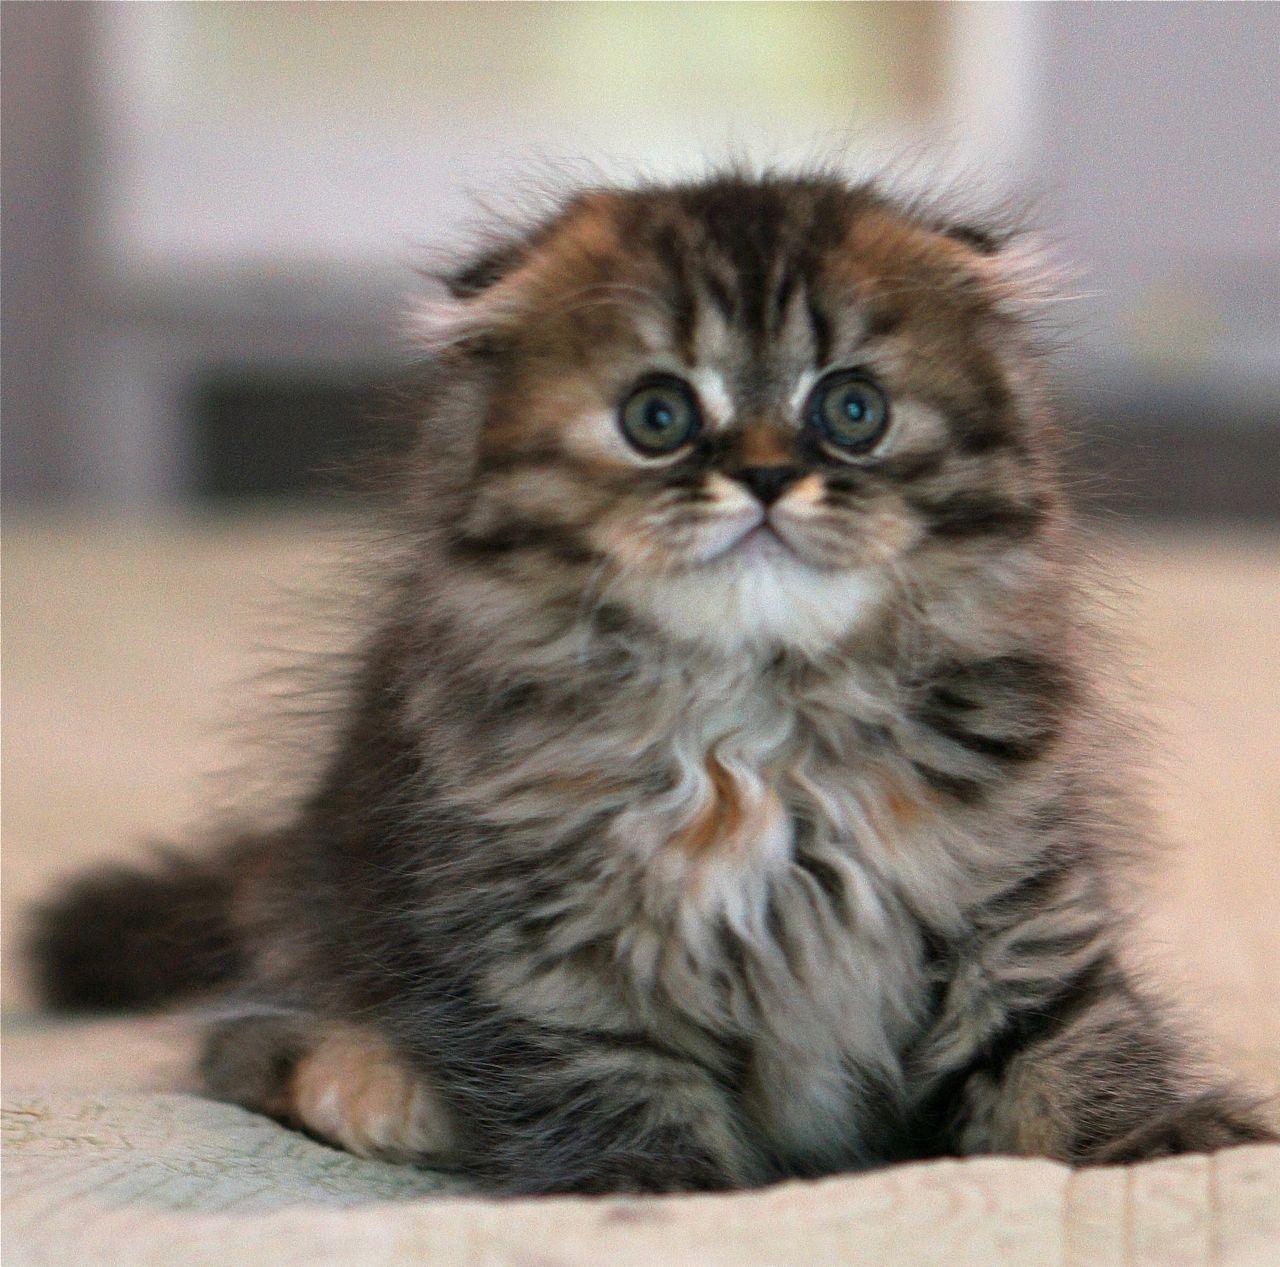 Rare Scottish Fold Munchkins Scottish Fold Kittens Price Range I Want This One Scottish Fold Kittens Scottish Fold Munchkin Cat